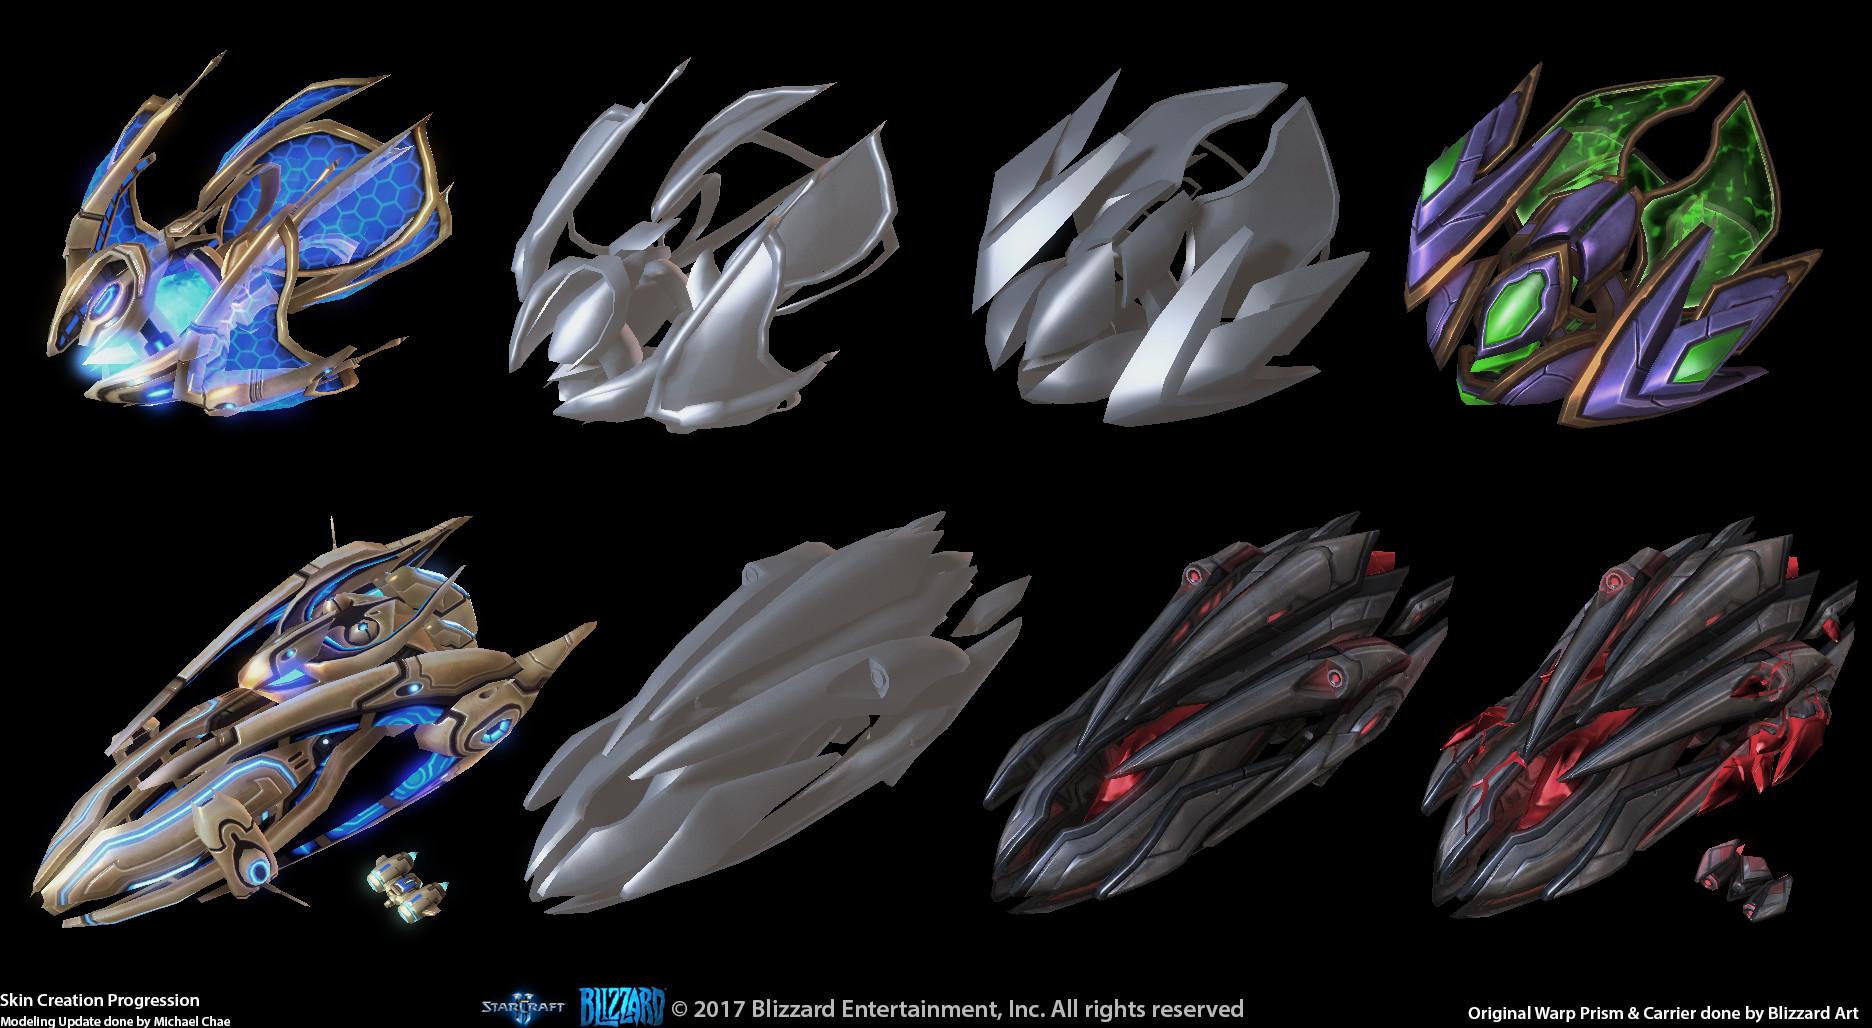 ArtStation - StarCraft 2, Extra Art Works: Concept & Premium